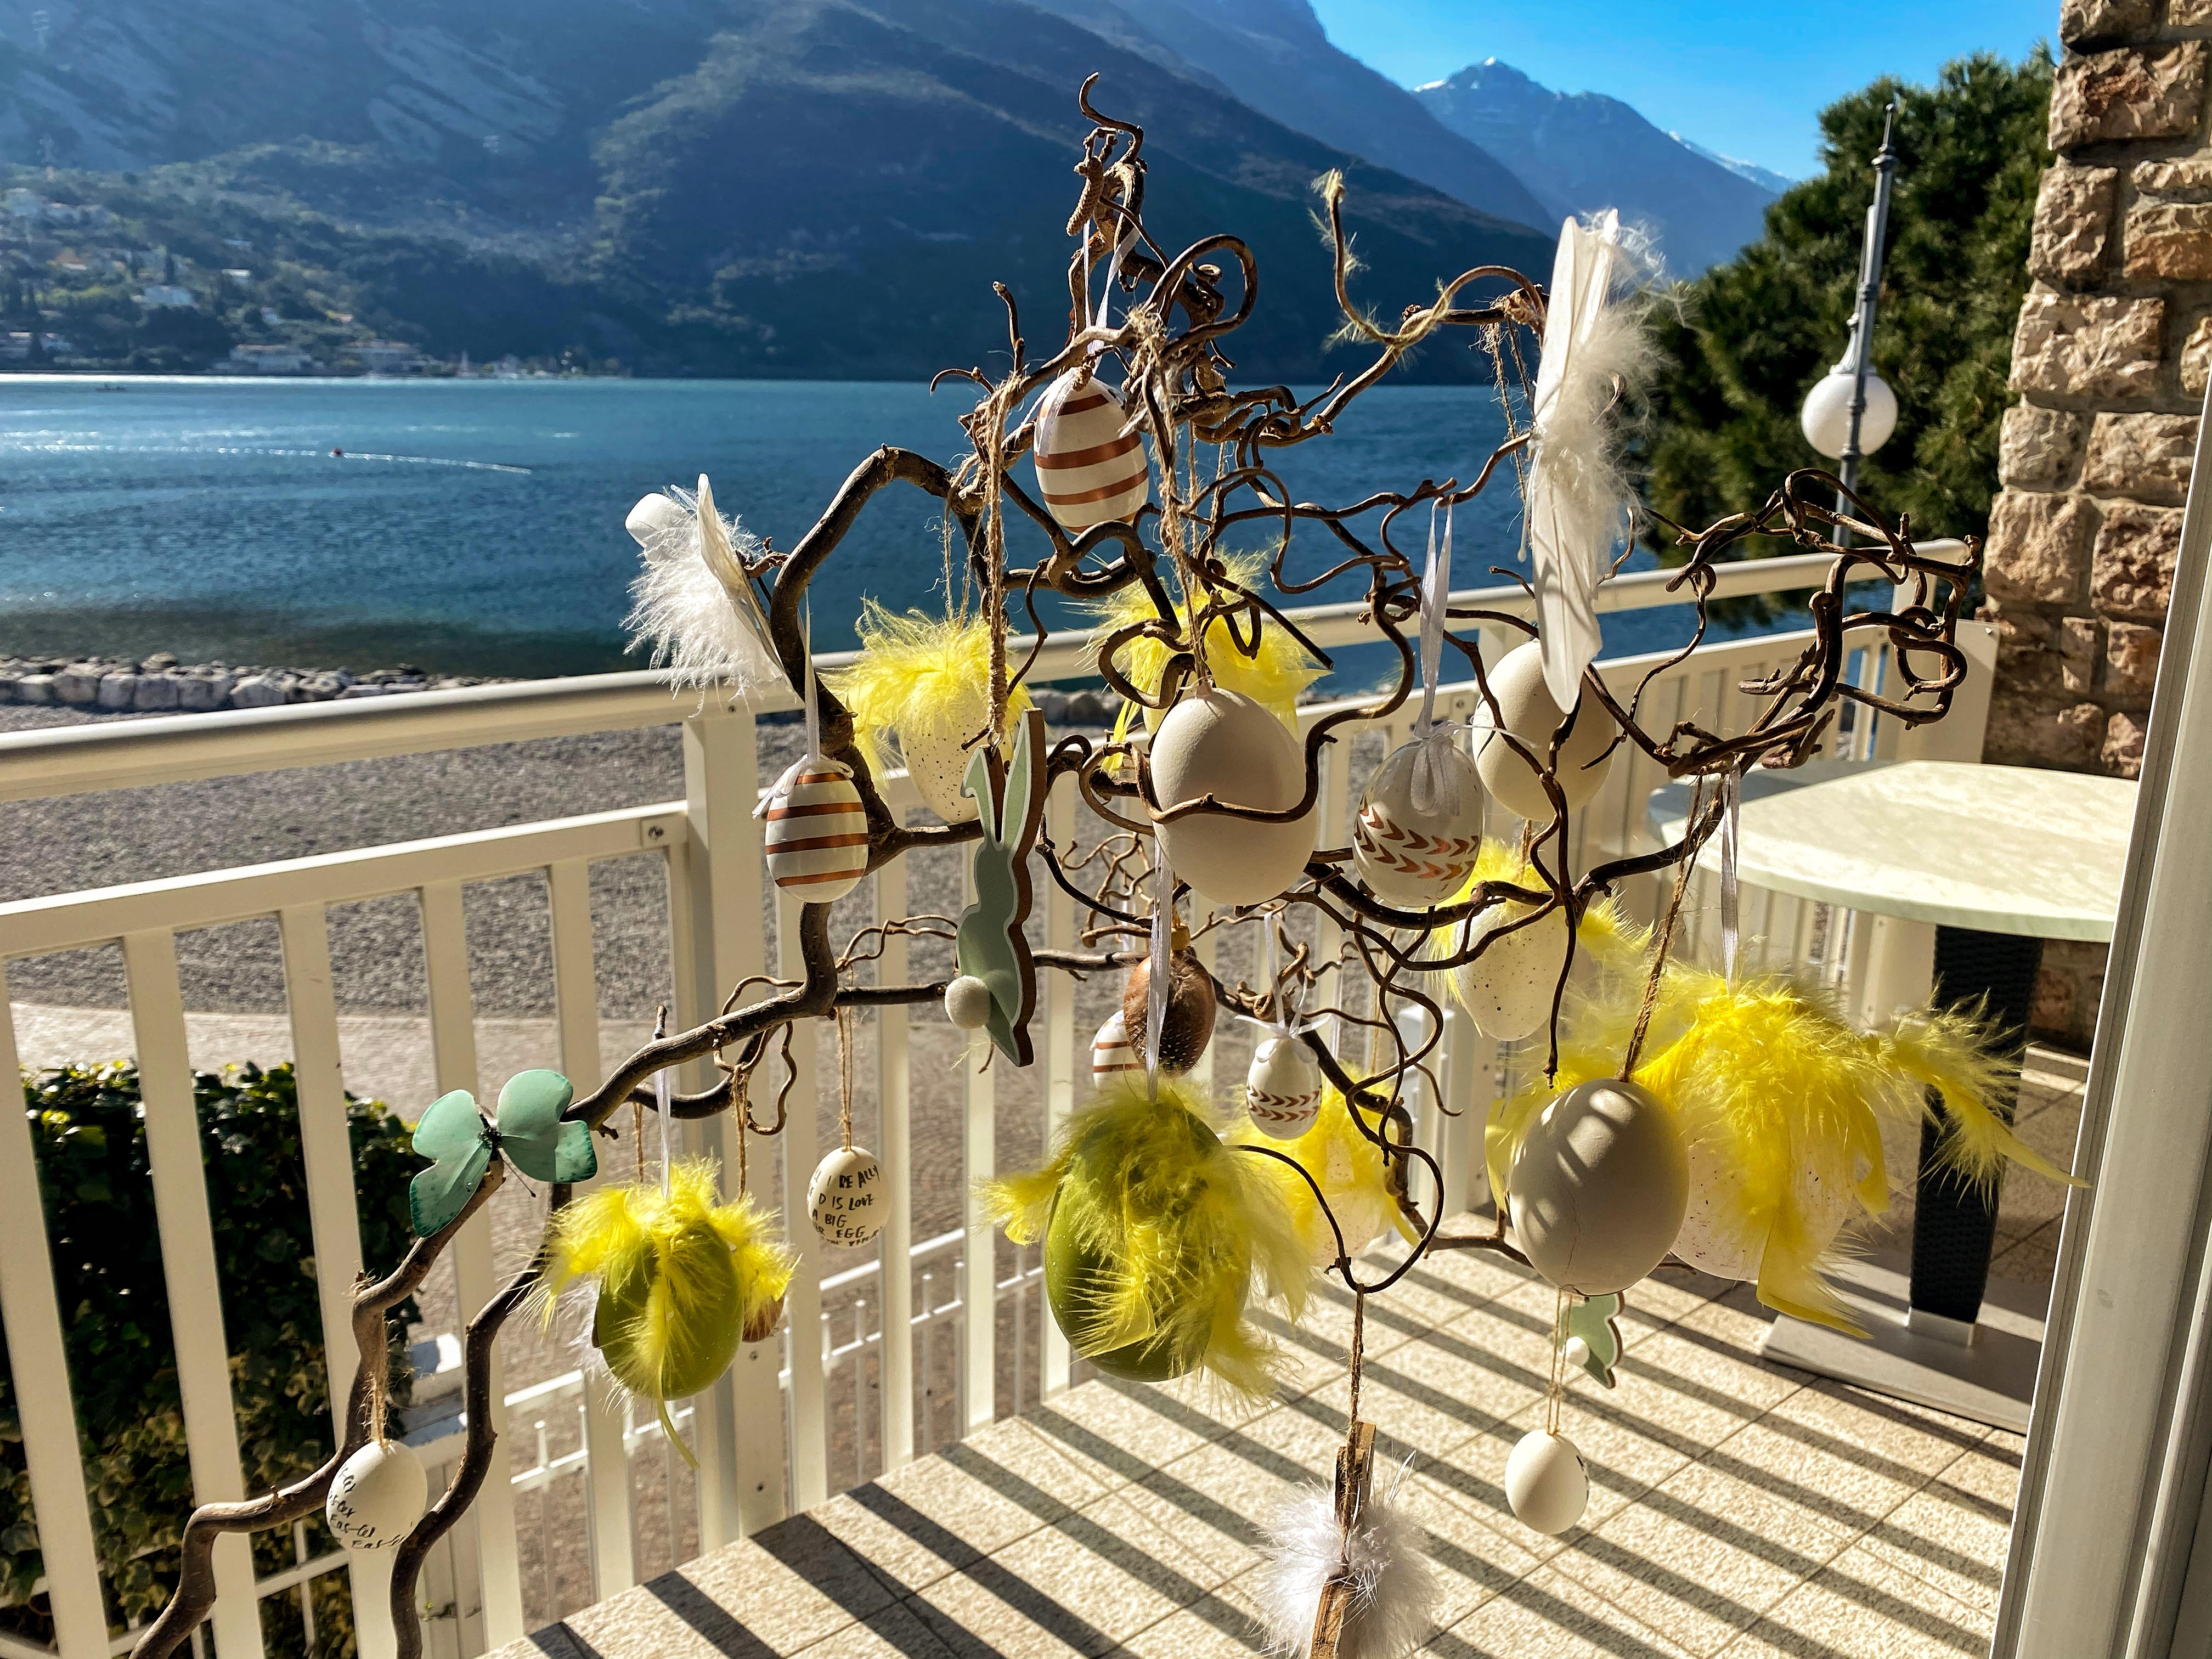 Easter 2022 on Lake Garda: a new, exciting season starts again